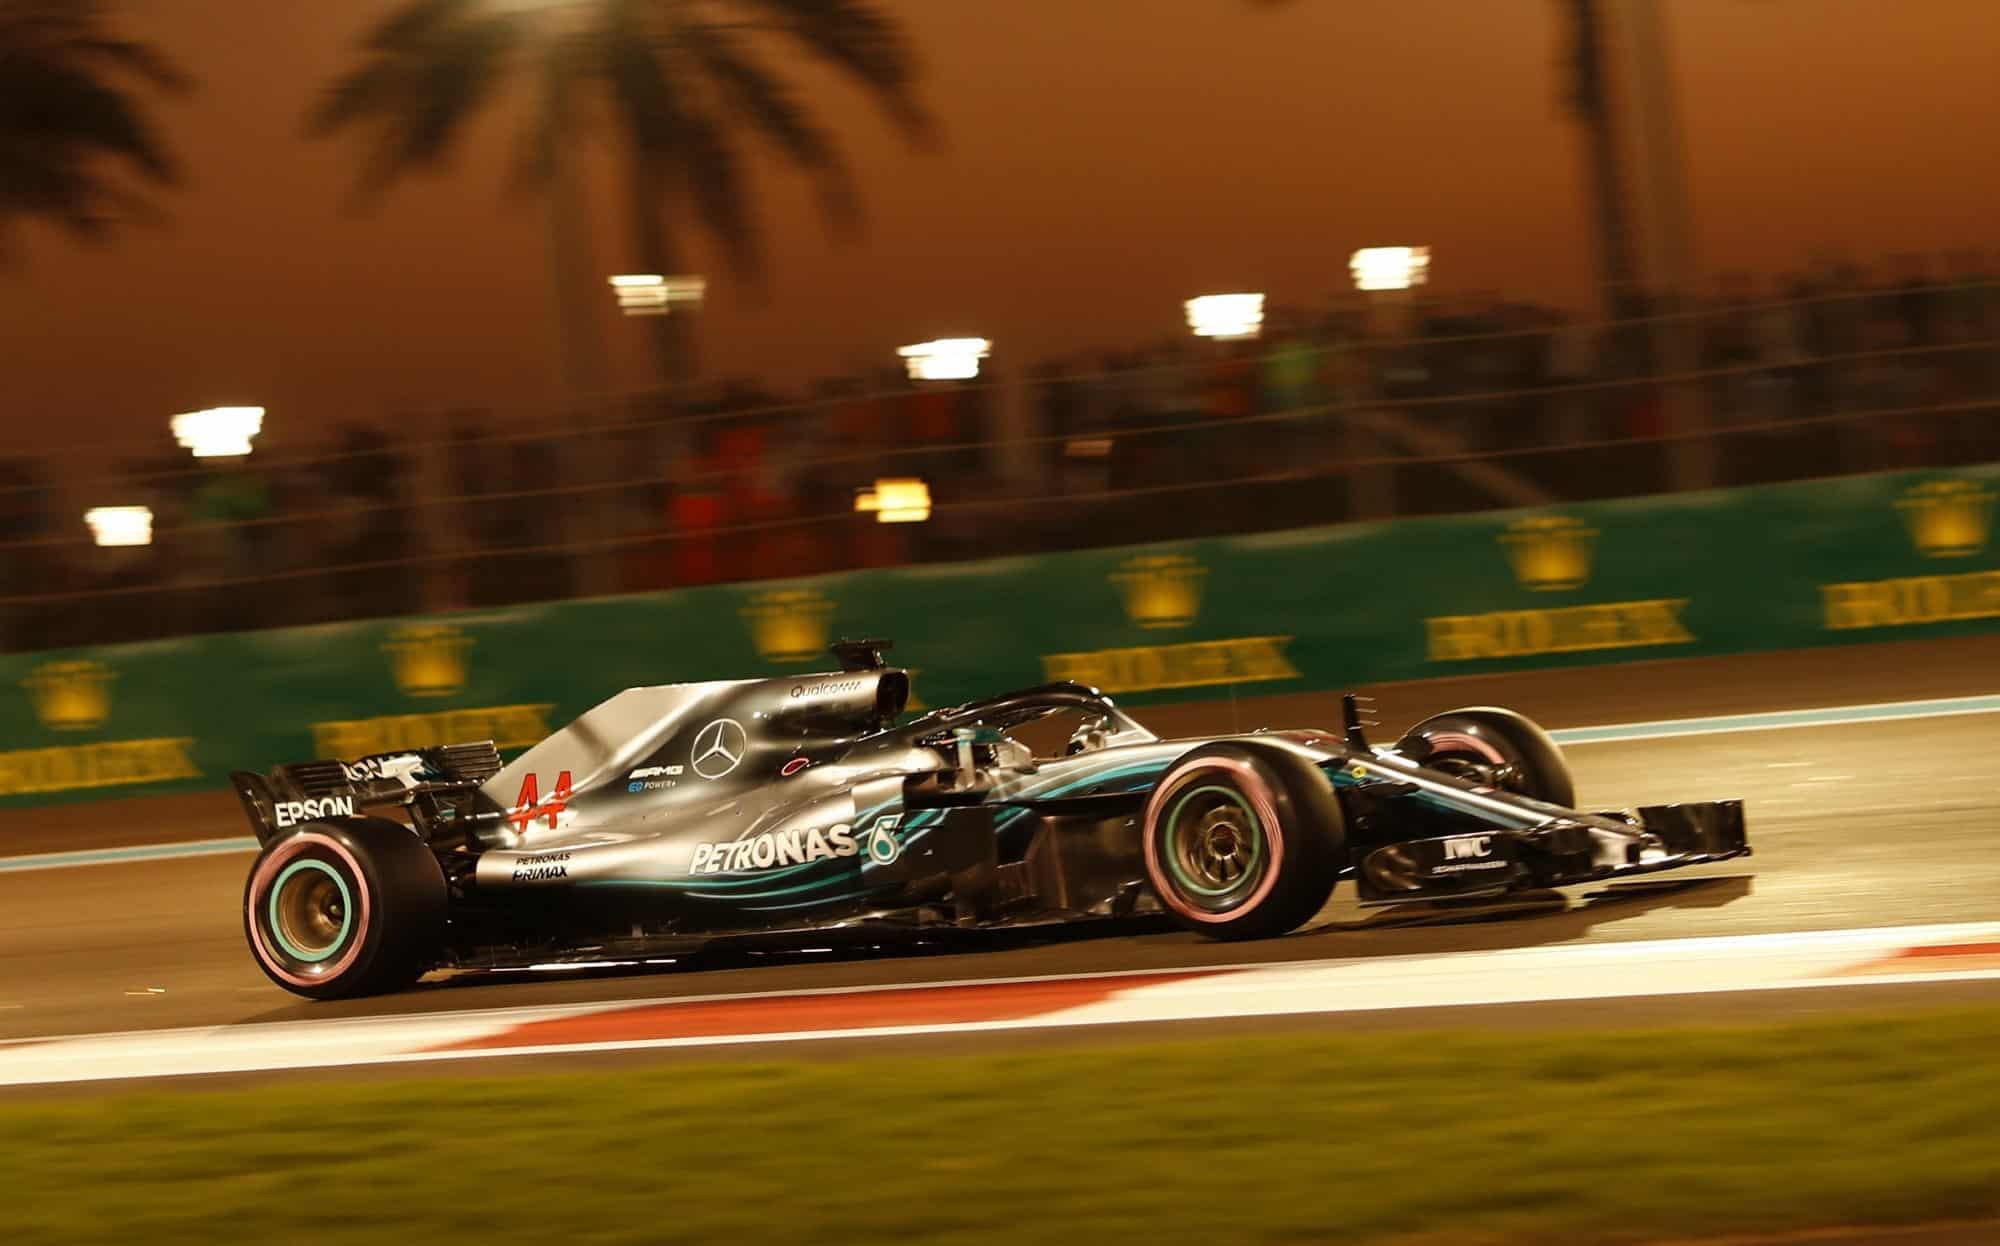 Hamilton Mercedes Abu Dhabi F1 2018 hypersoft Photo Daimler